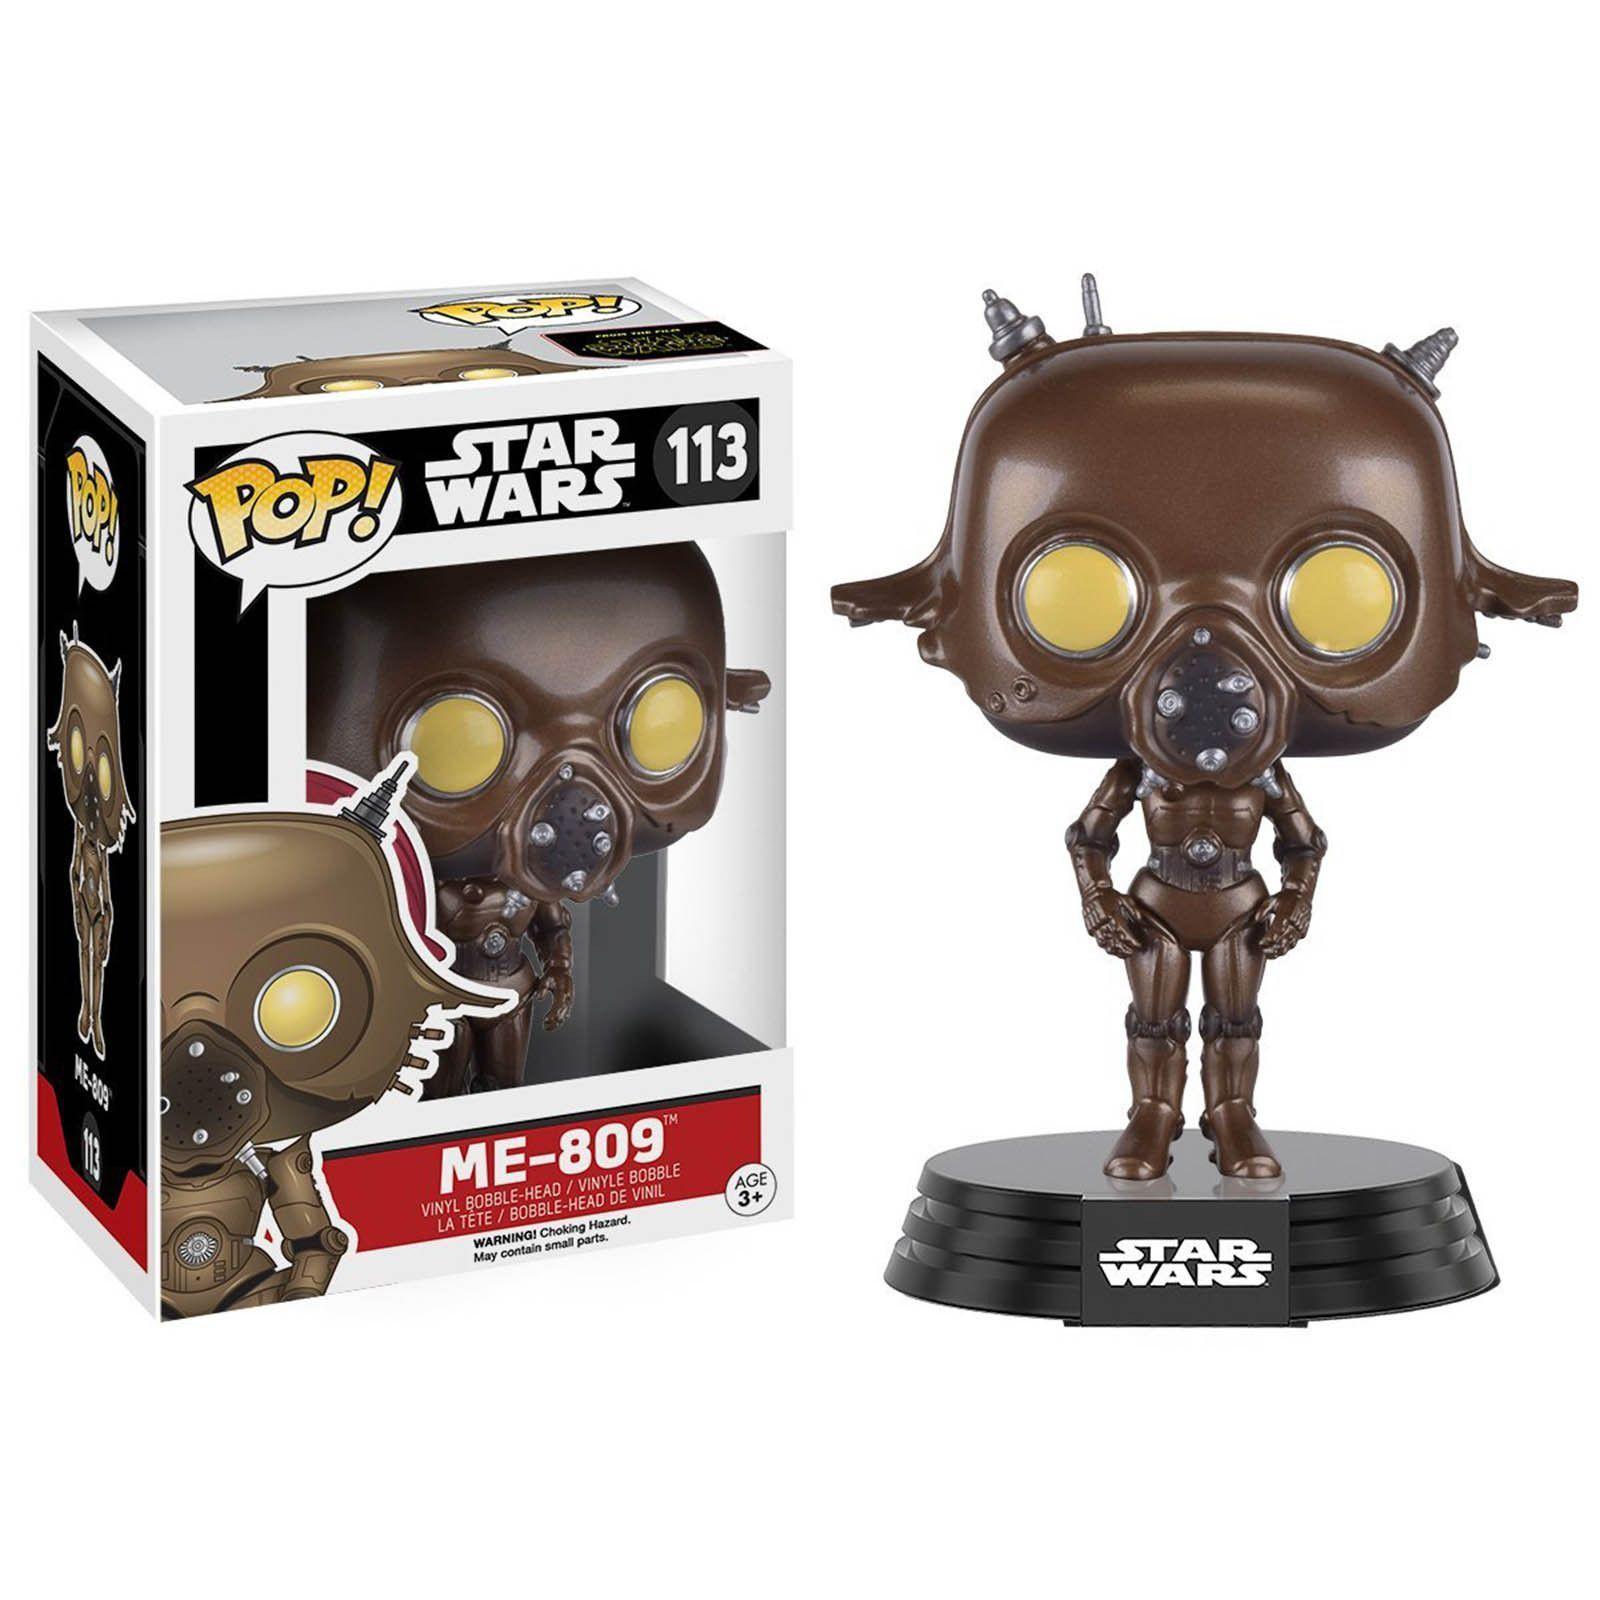 Funko Star Wars Force Awakens POP ME-809 Bobble Head Vinyl Figure - Radar Toys